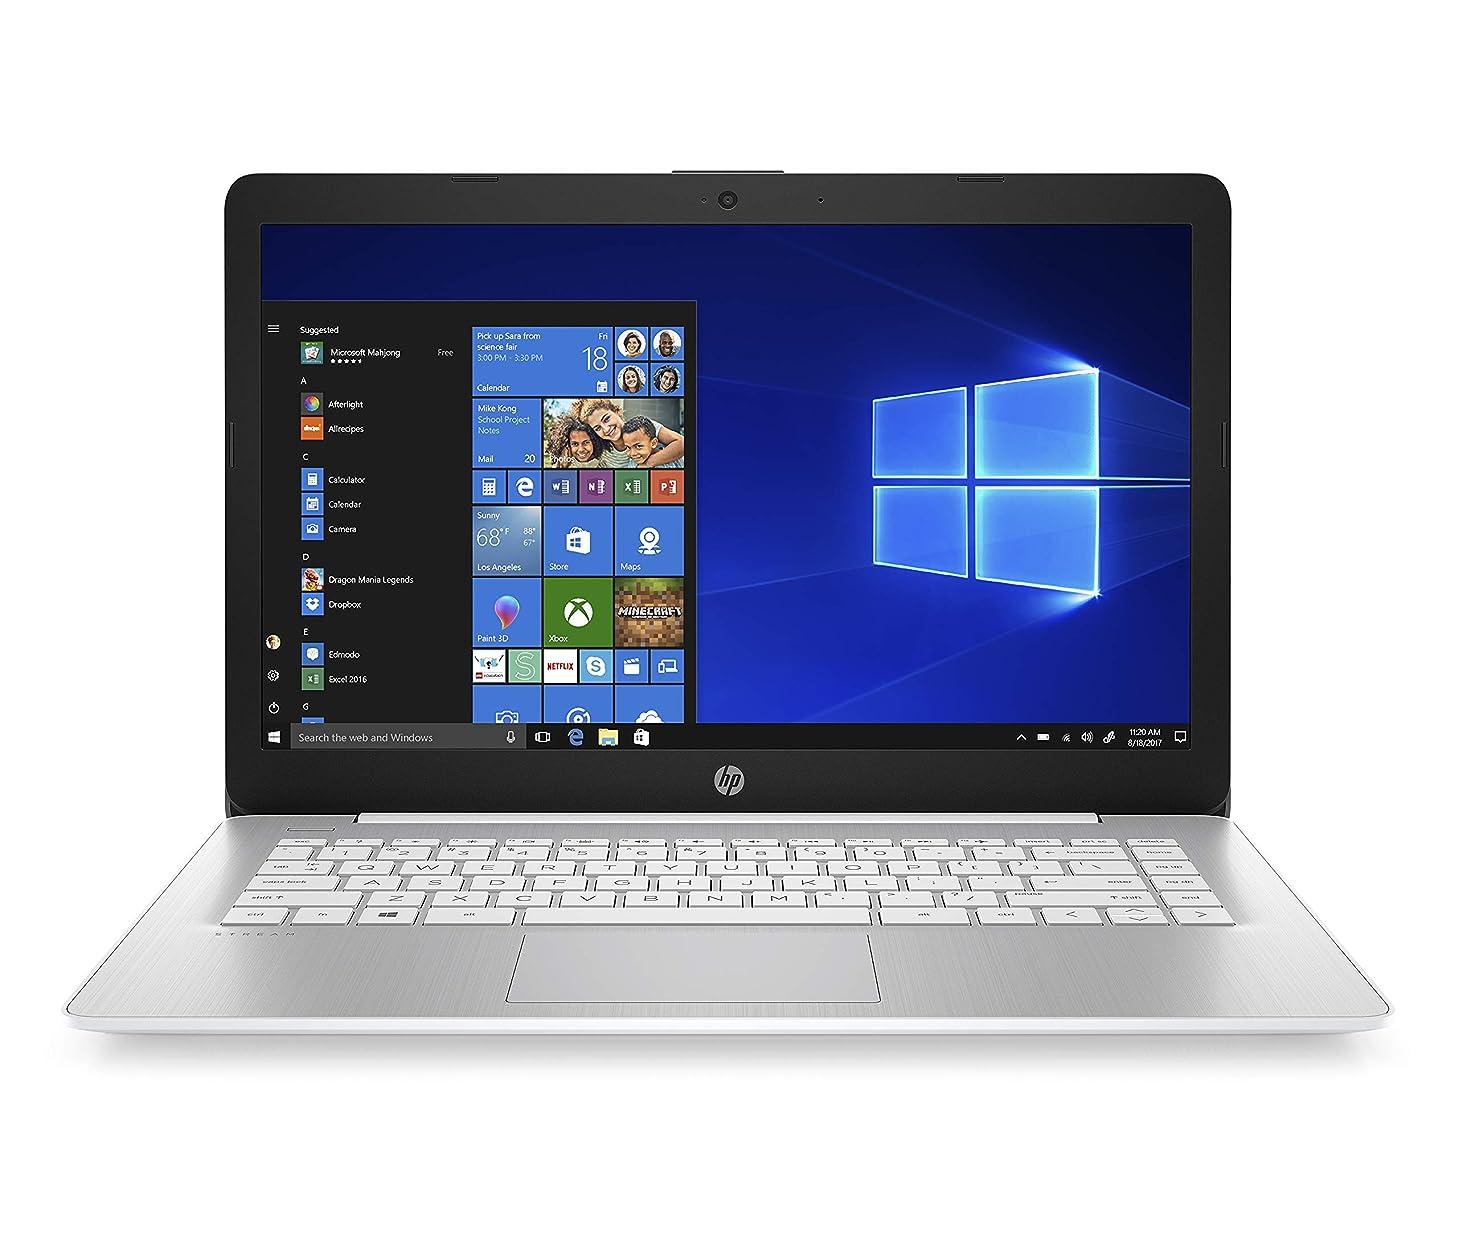 HP Stream 14-inch Laptop, AMD Dual-Core A4-9120E, 4GB RAM, 64GB eMMC Storage, Windows 10 S (14-ds0070nr, Blue)